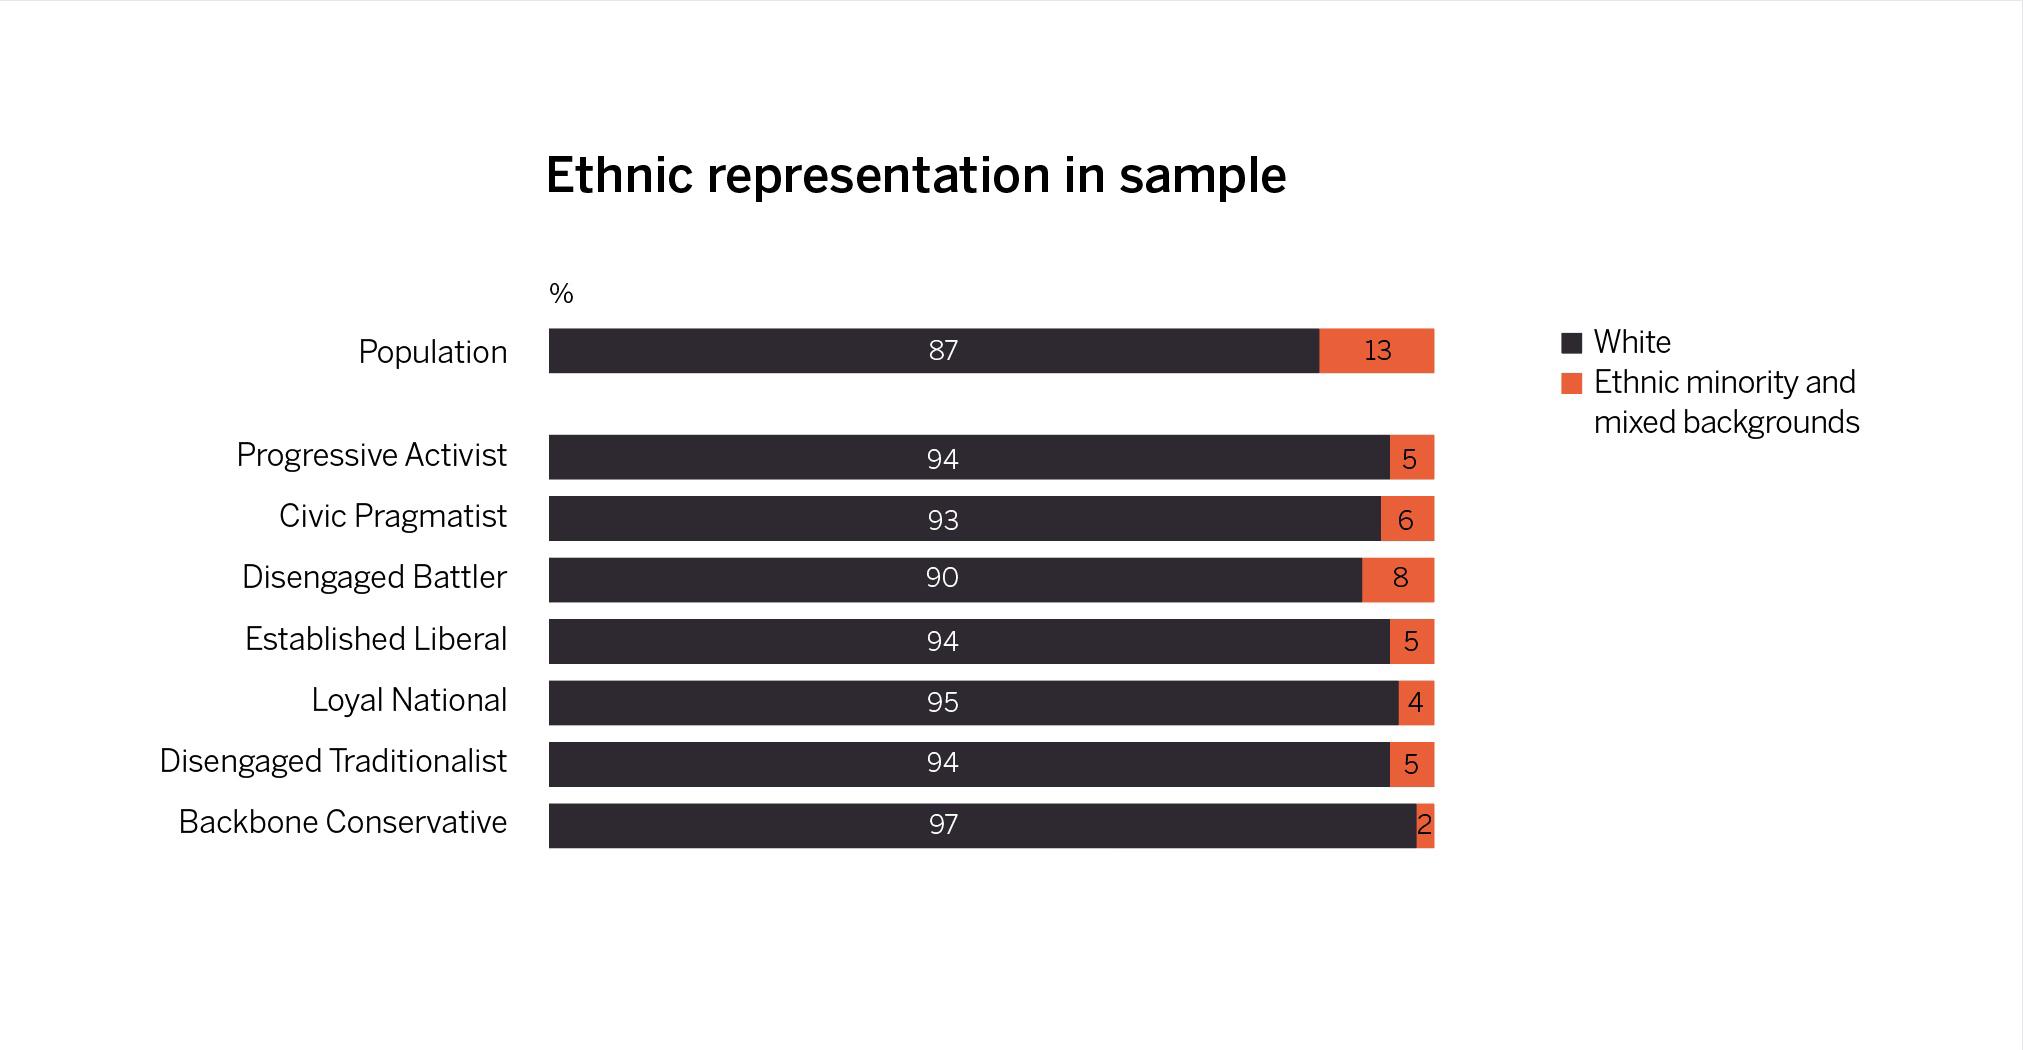 Ethnic representation in each segment compared to the population